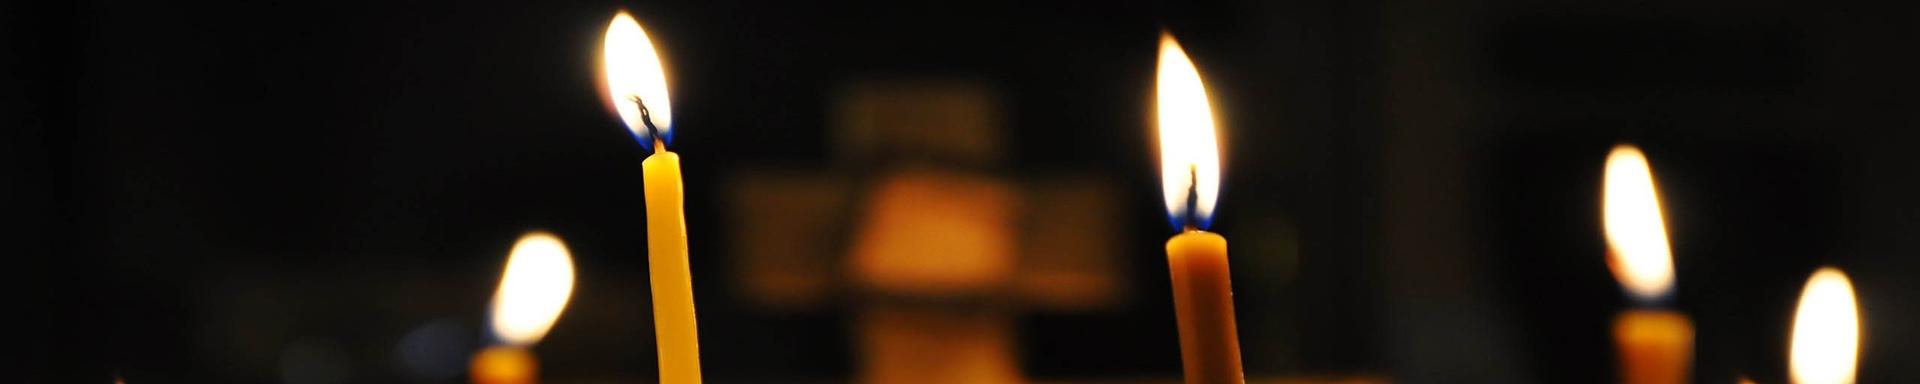 Kirche-Titel-Background-Kirche-Kerzen